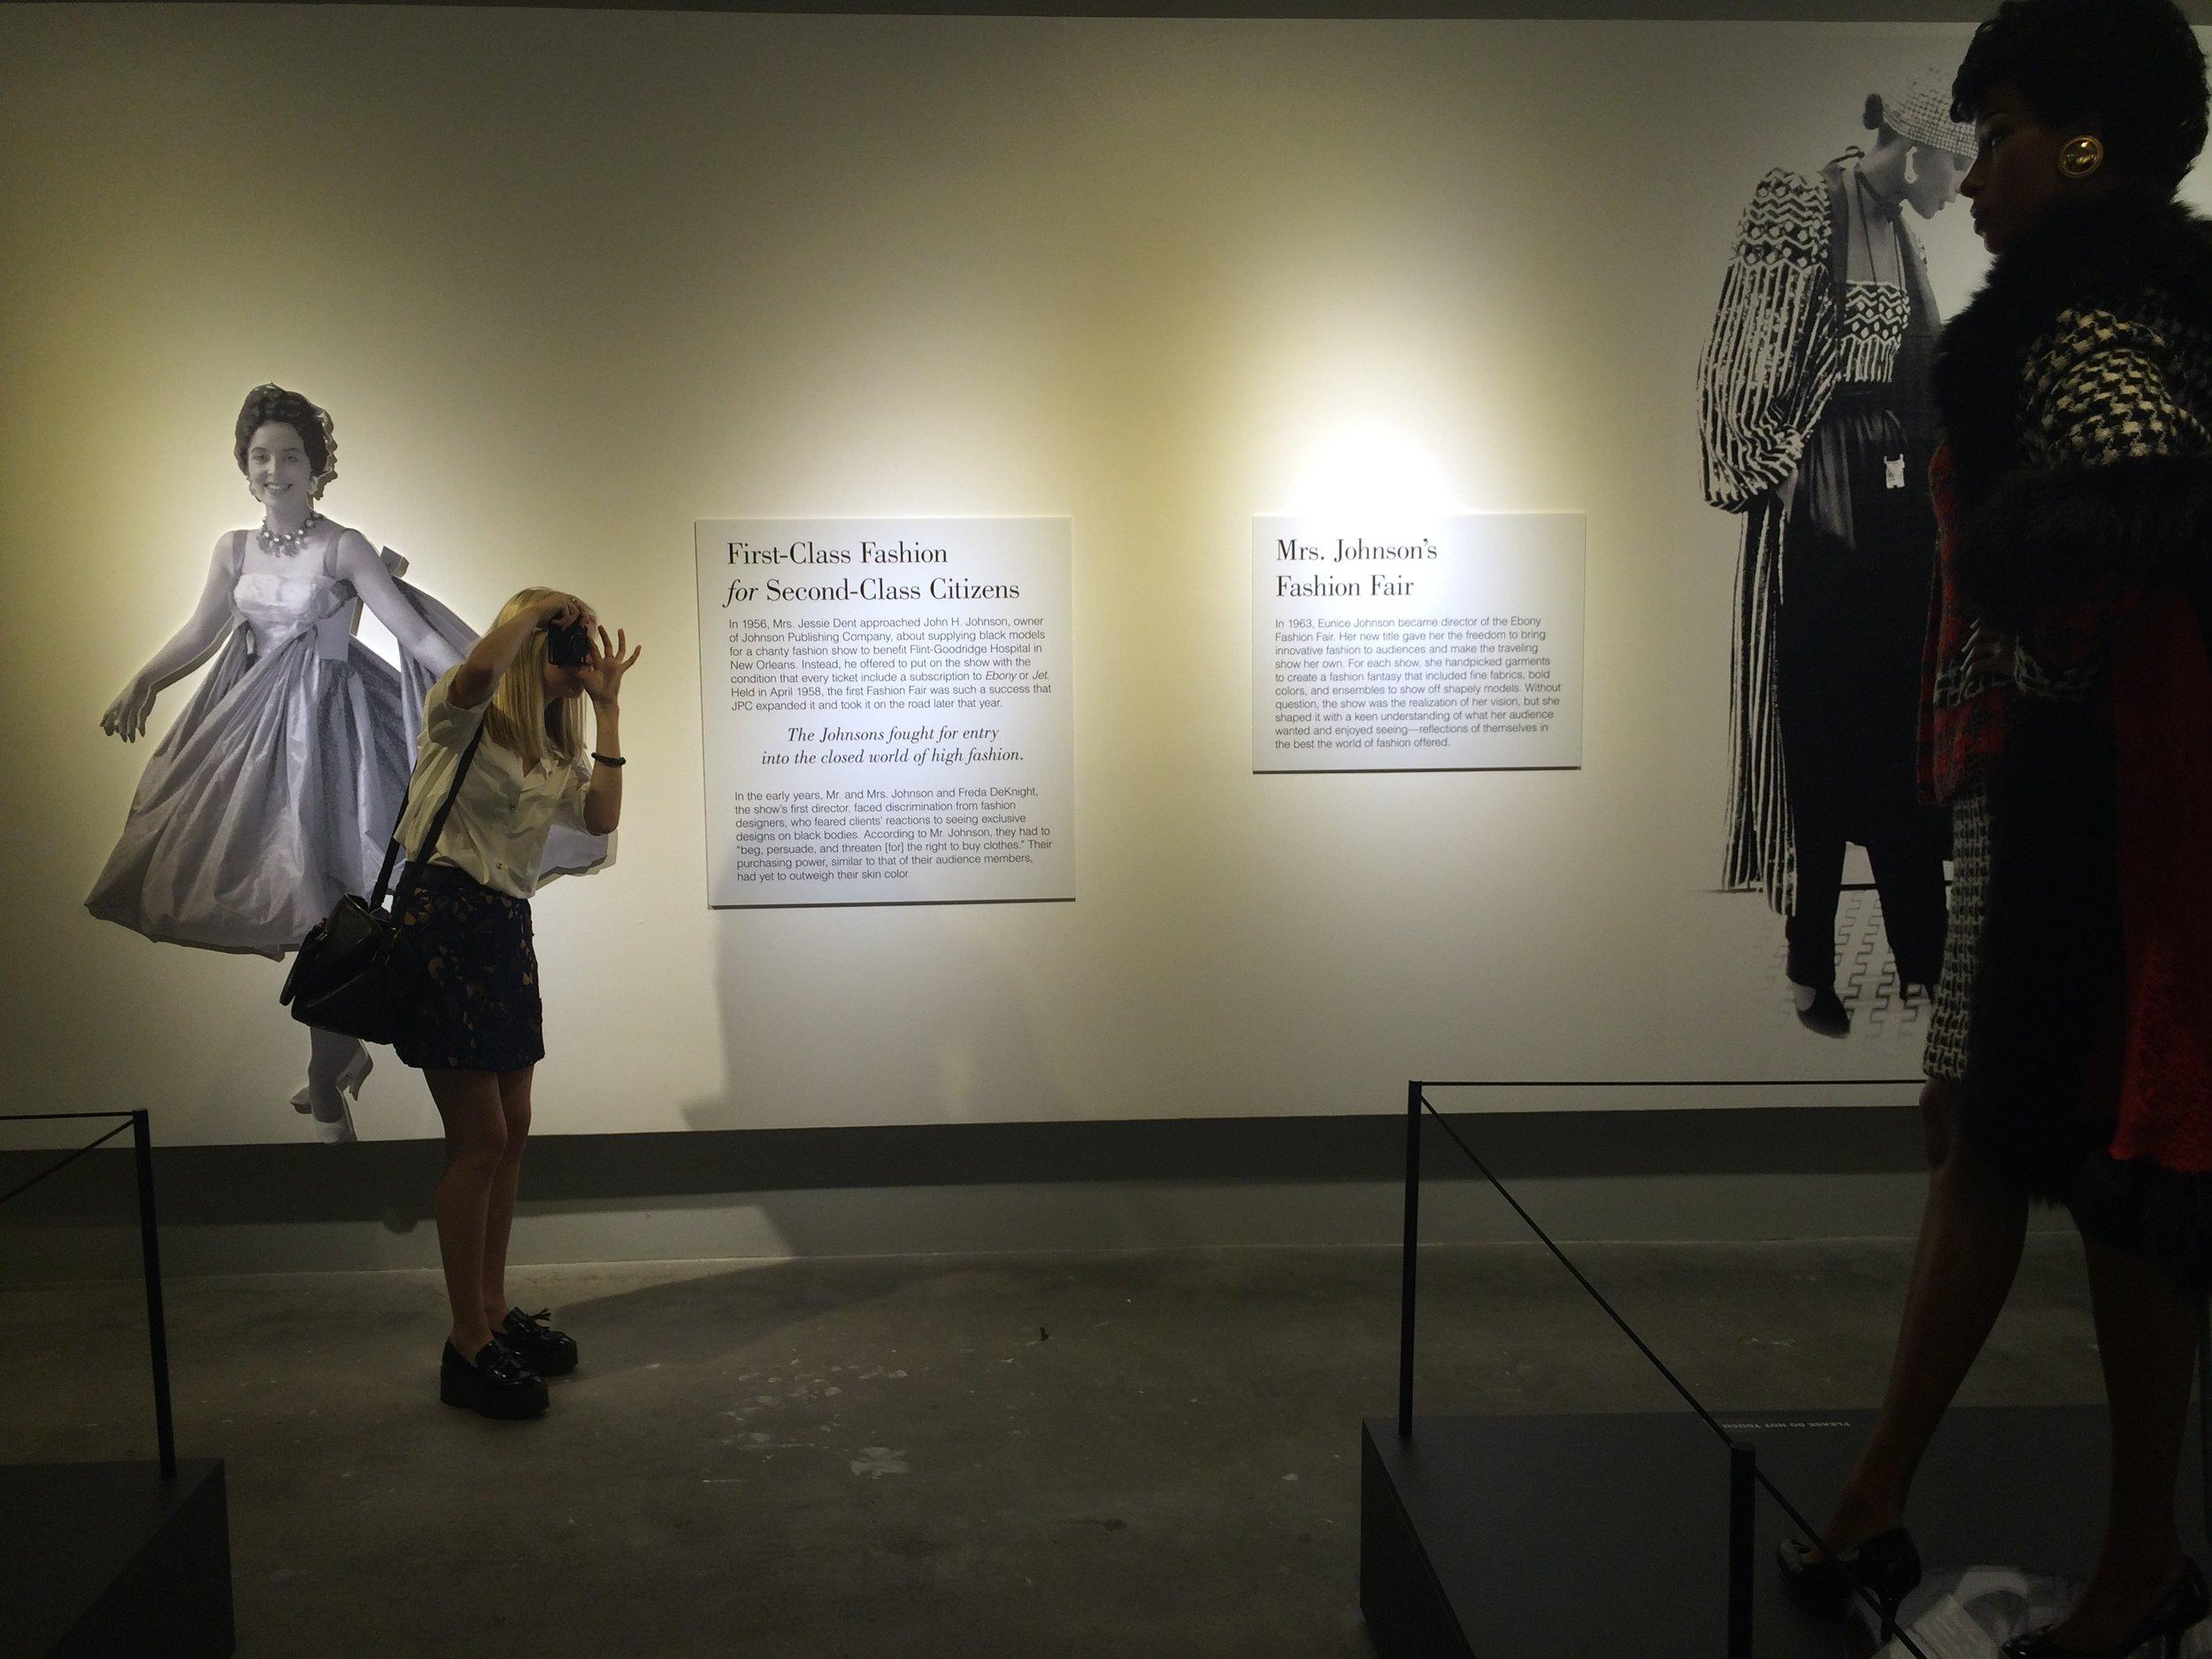 Atlanta Photo Diary: Ebony Fashion Fair Exhibit, Liz Best, Liz-Best, Museum of Design Atlanta, exhibition, fashion, Erica Johnson, Ebony magazine, history of fashion fair